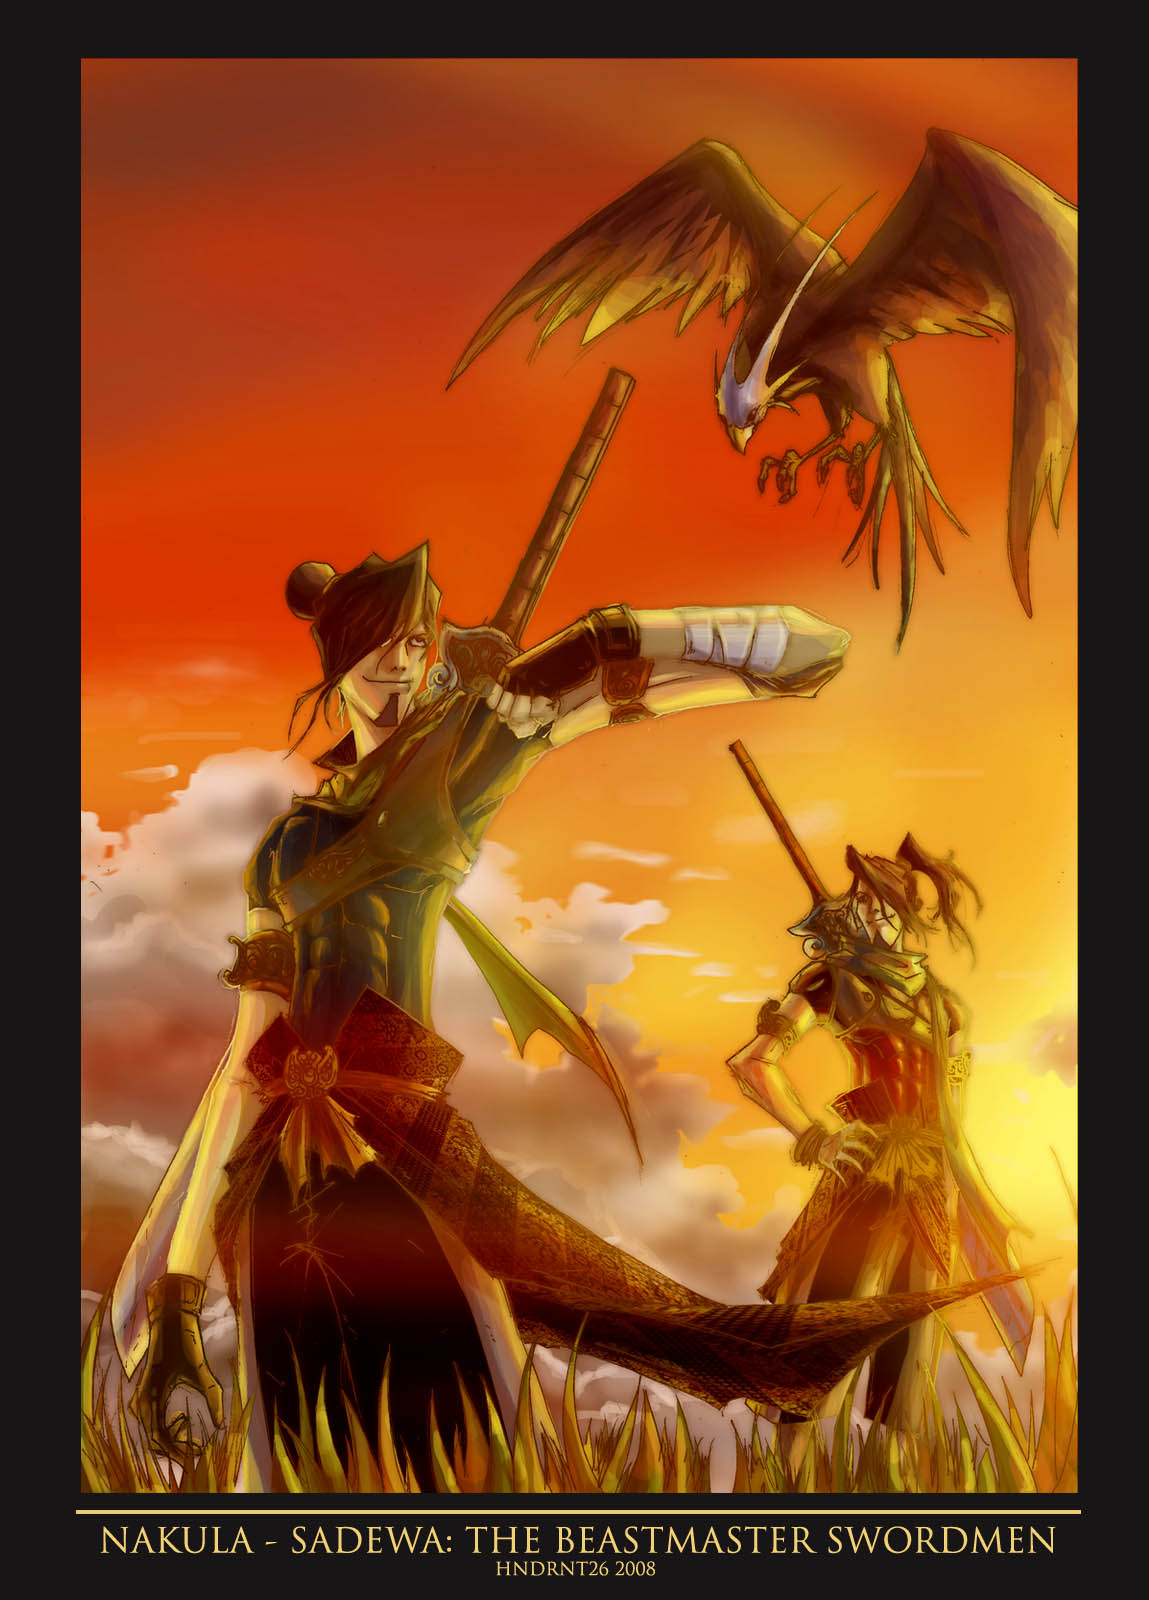 Kisah para pandawa sangat terkenal di nusantara, yang memiliki arti putra pandu dewanegara, sang raja hastinapura. BLOG'en Home: ANIME WAYANG : prajurid Dewa